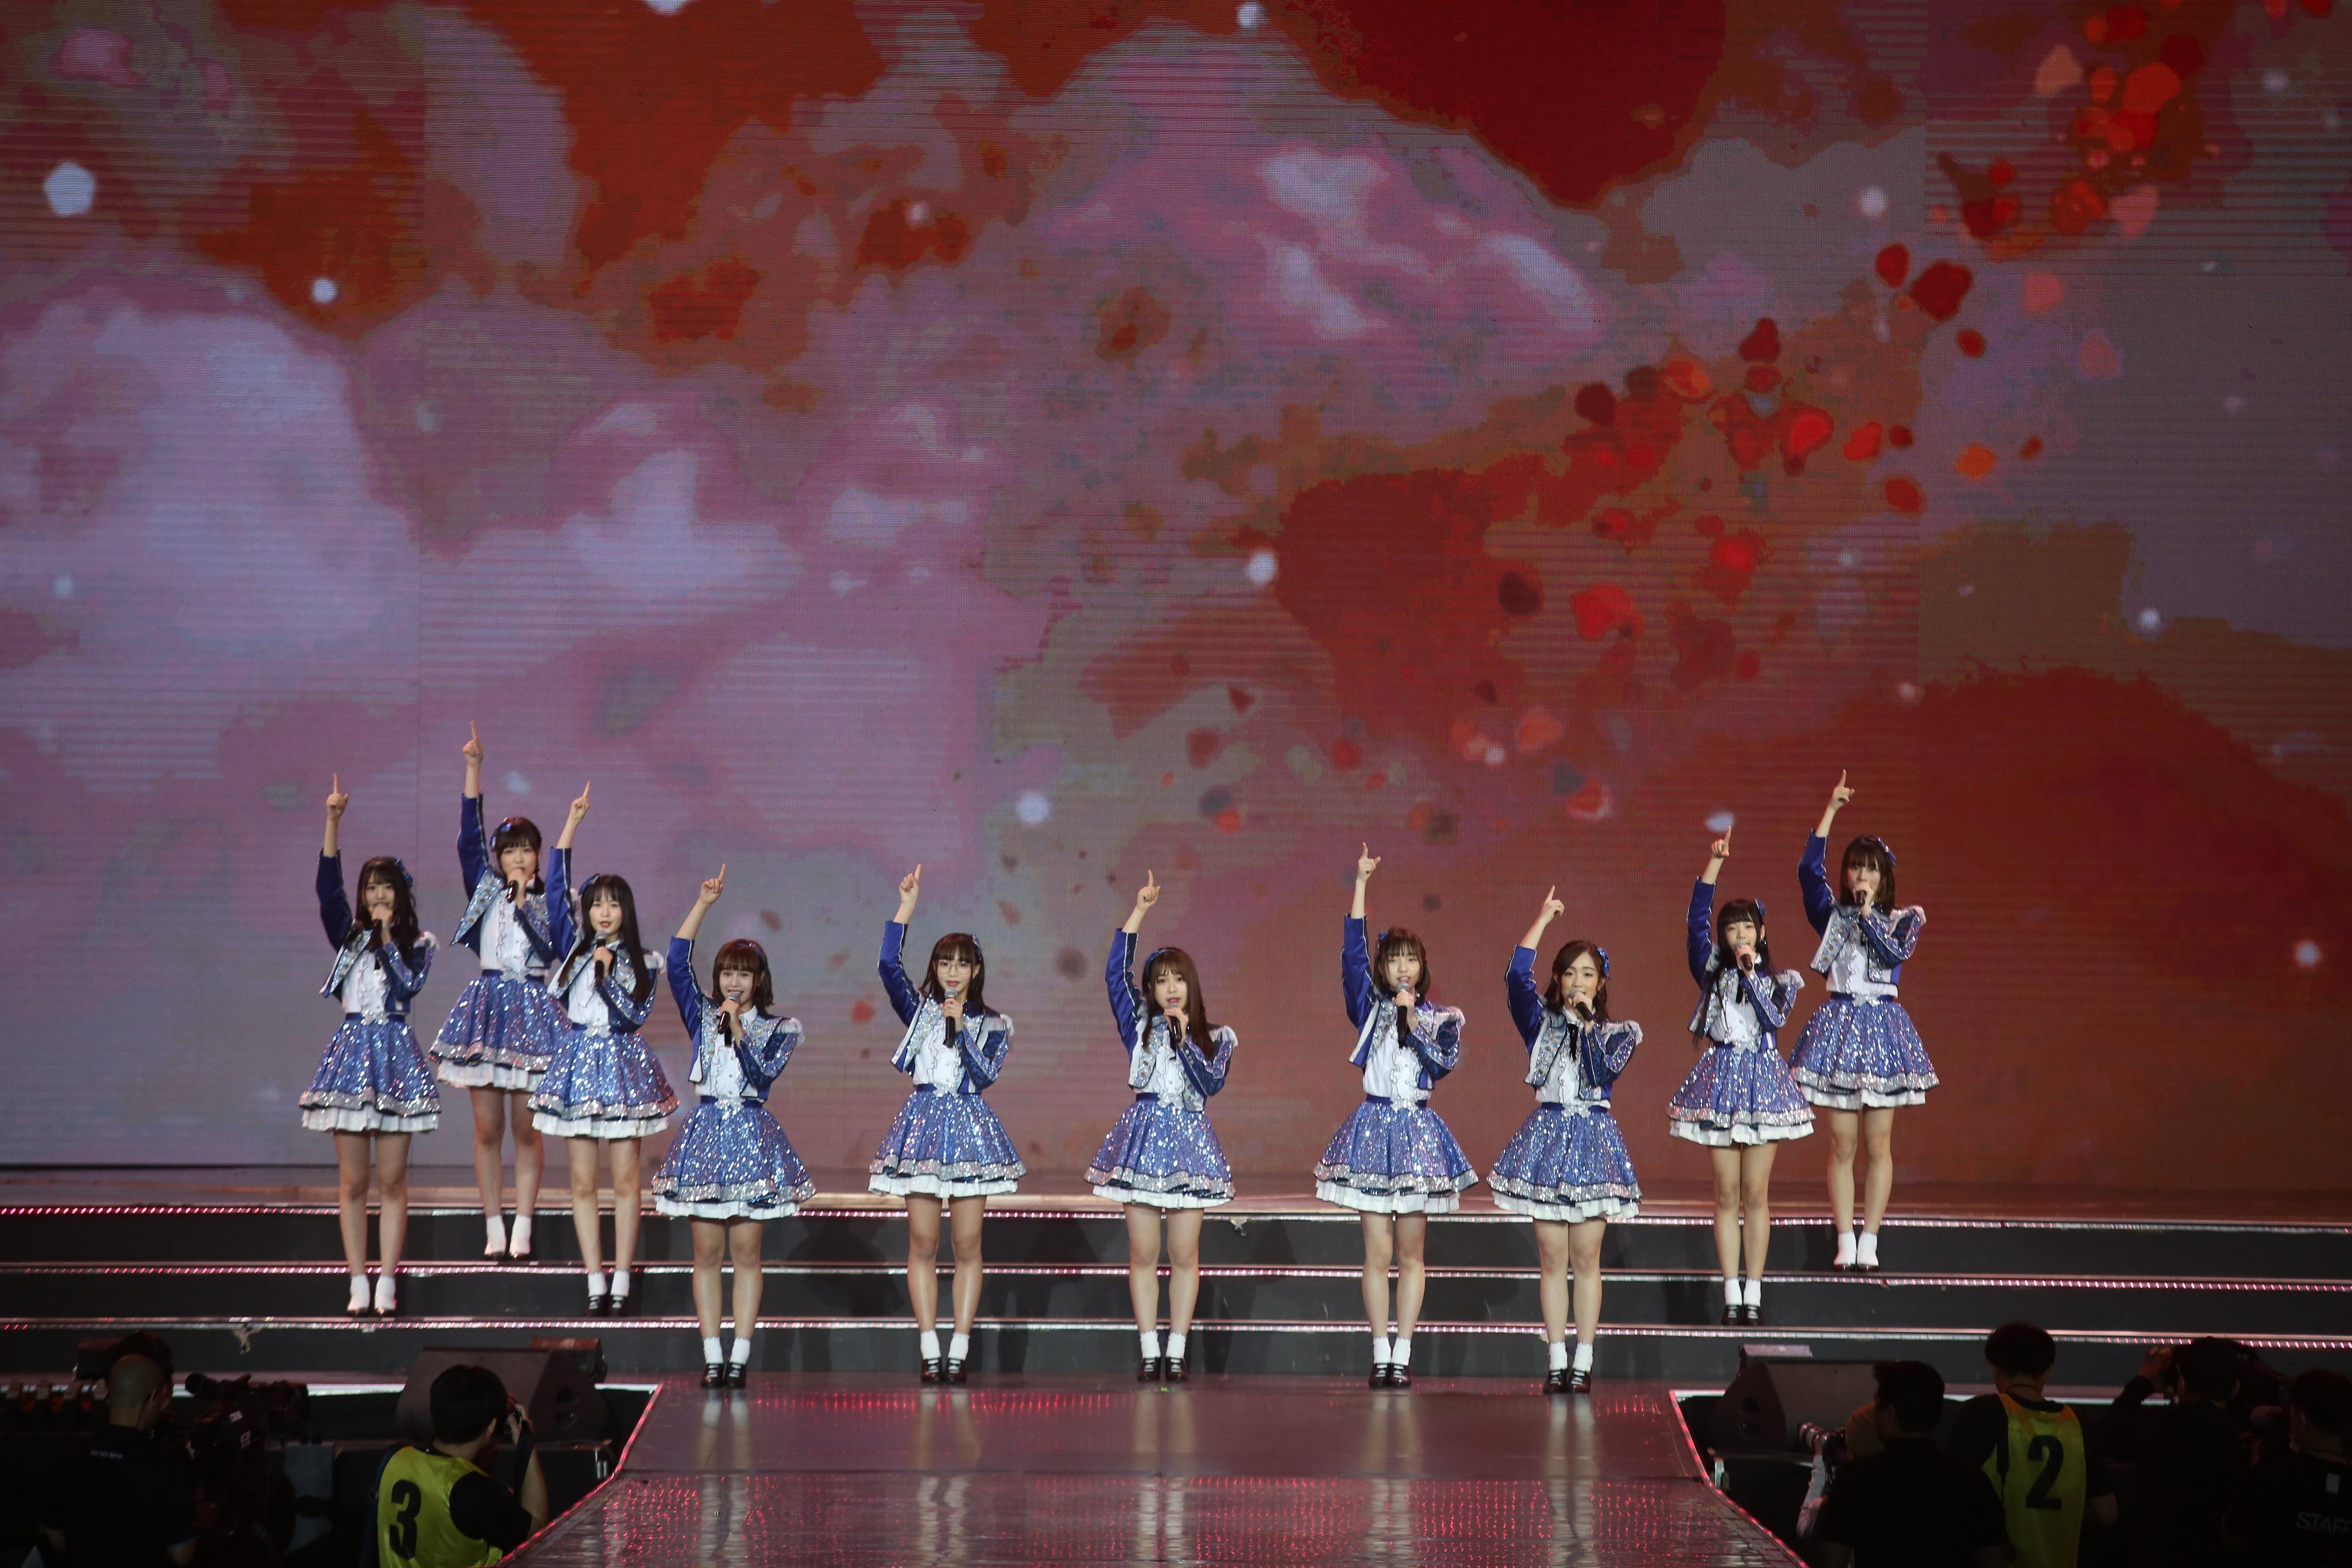 AKB48ほか、海外の姉妹グループが集結し『恋するフォーチュンクッキー』を熱唱!【写真23枚】の画像005